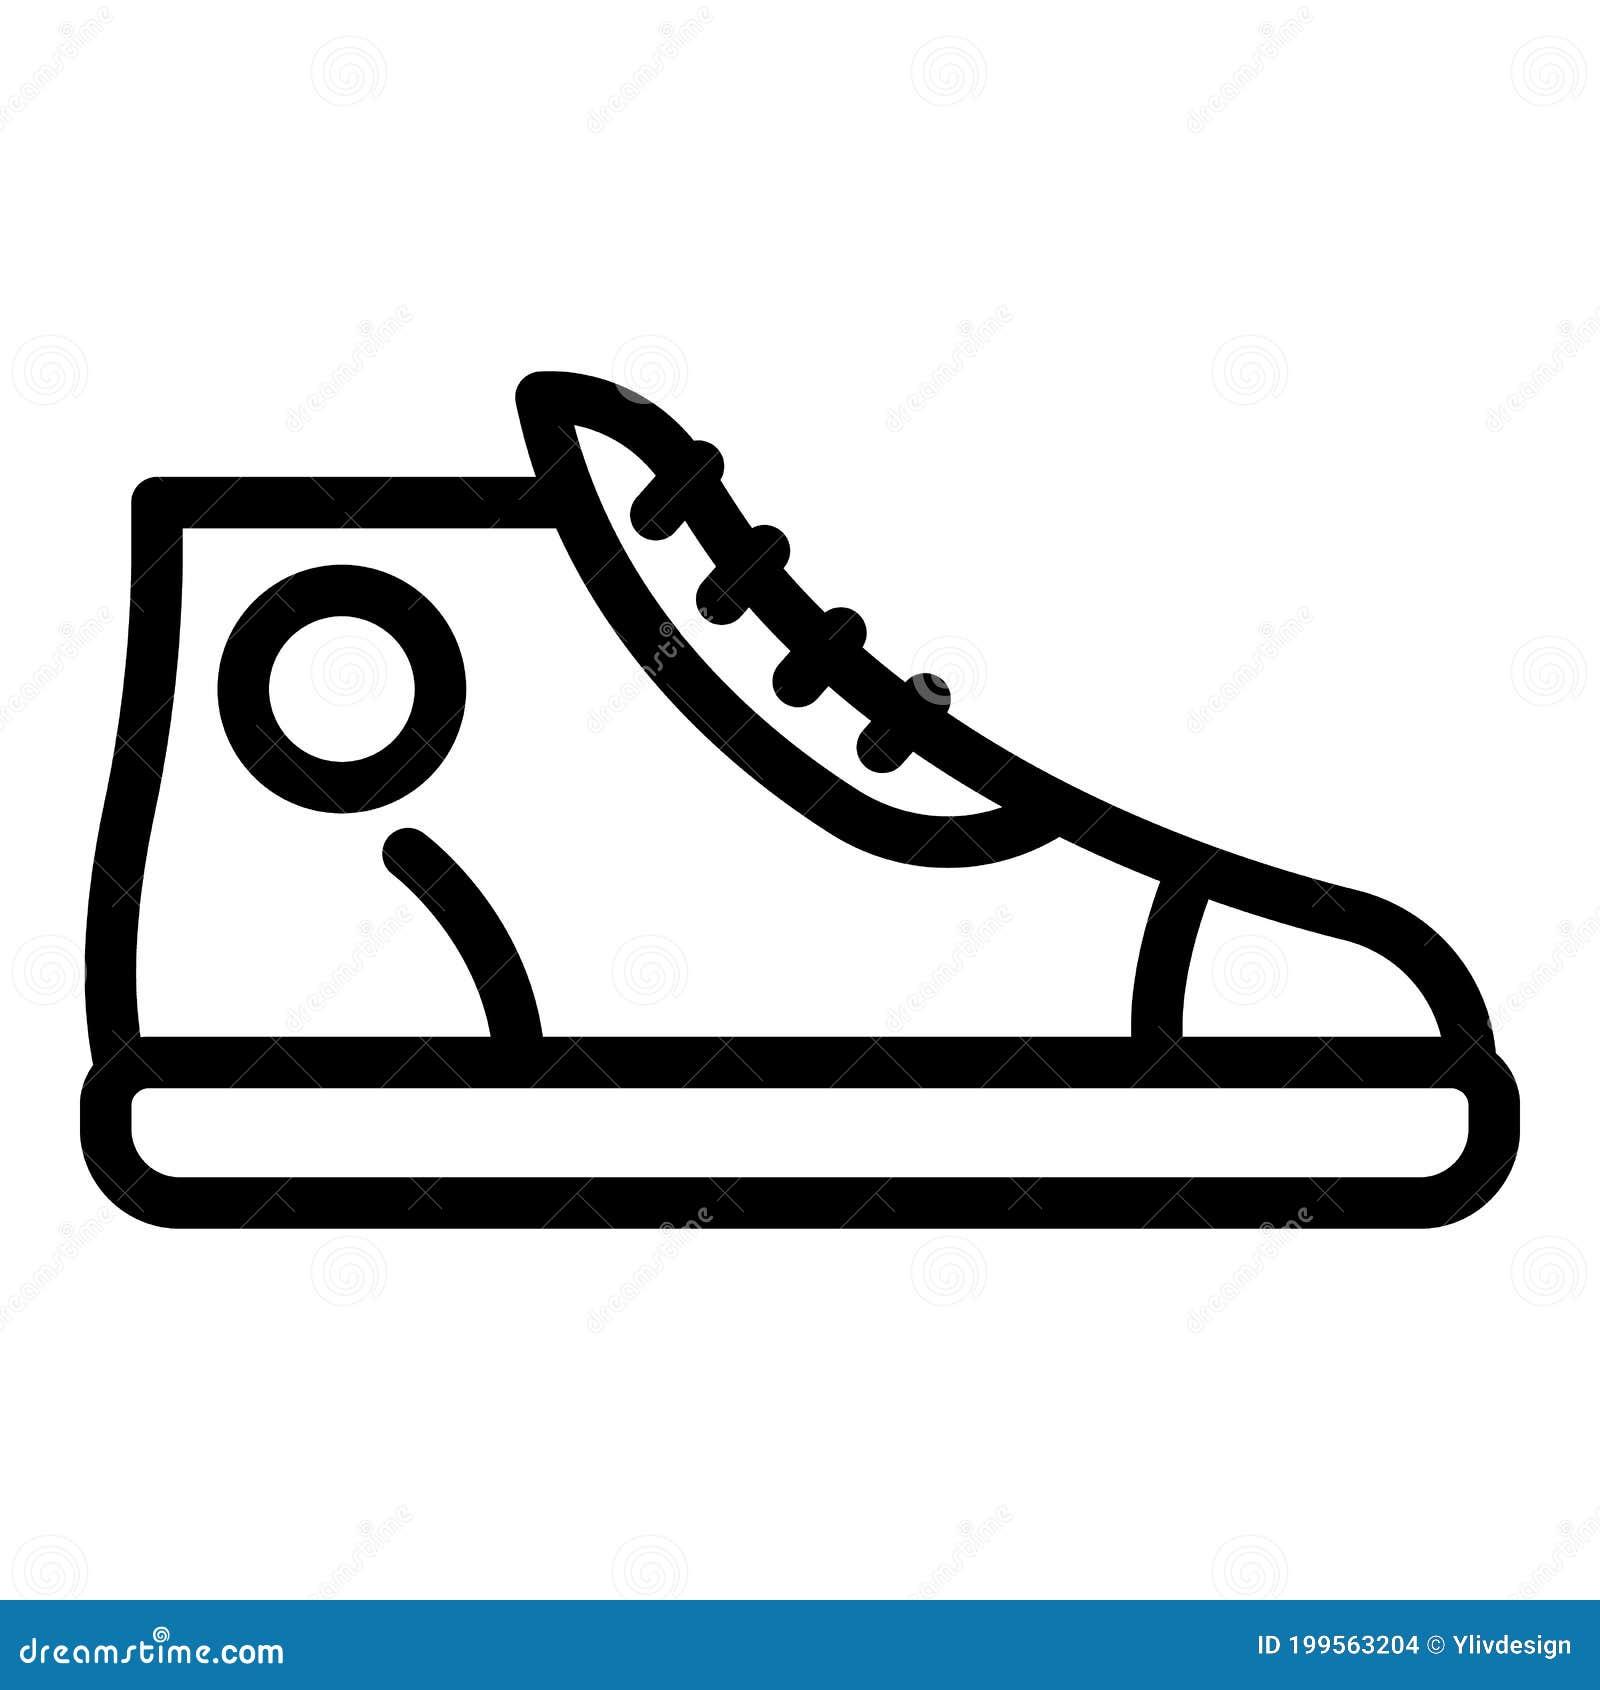 Cortar Lógicamente monstruo  Adidas Stock Illustrations – 196 Adidas Stock Illustrations, Vectors &  Clipart - Dreamstime